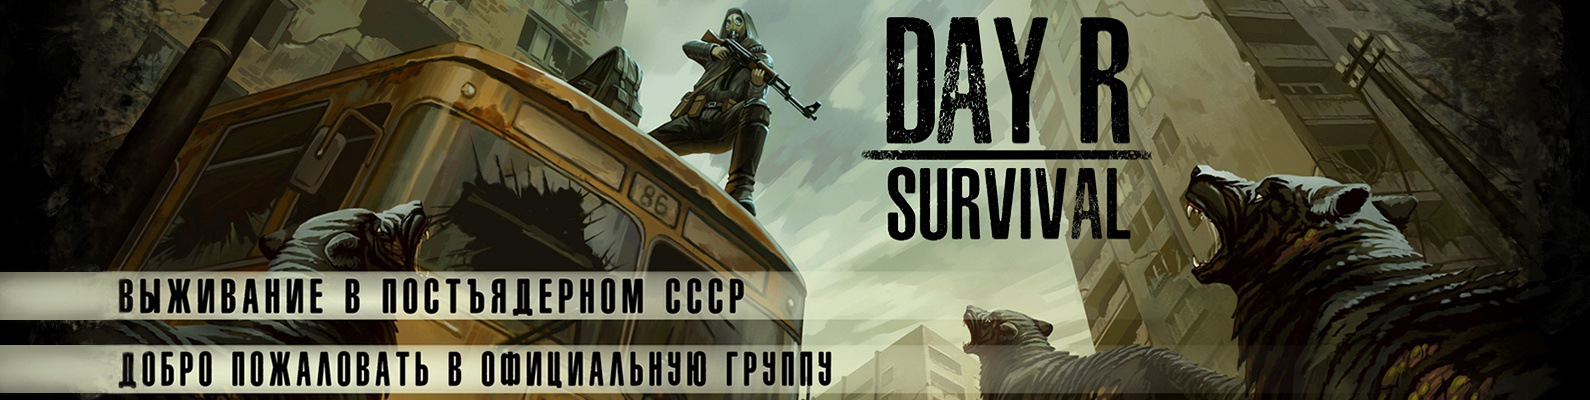 day r survival промокод